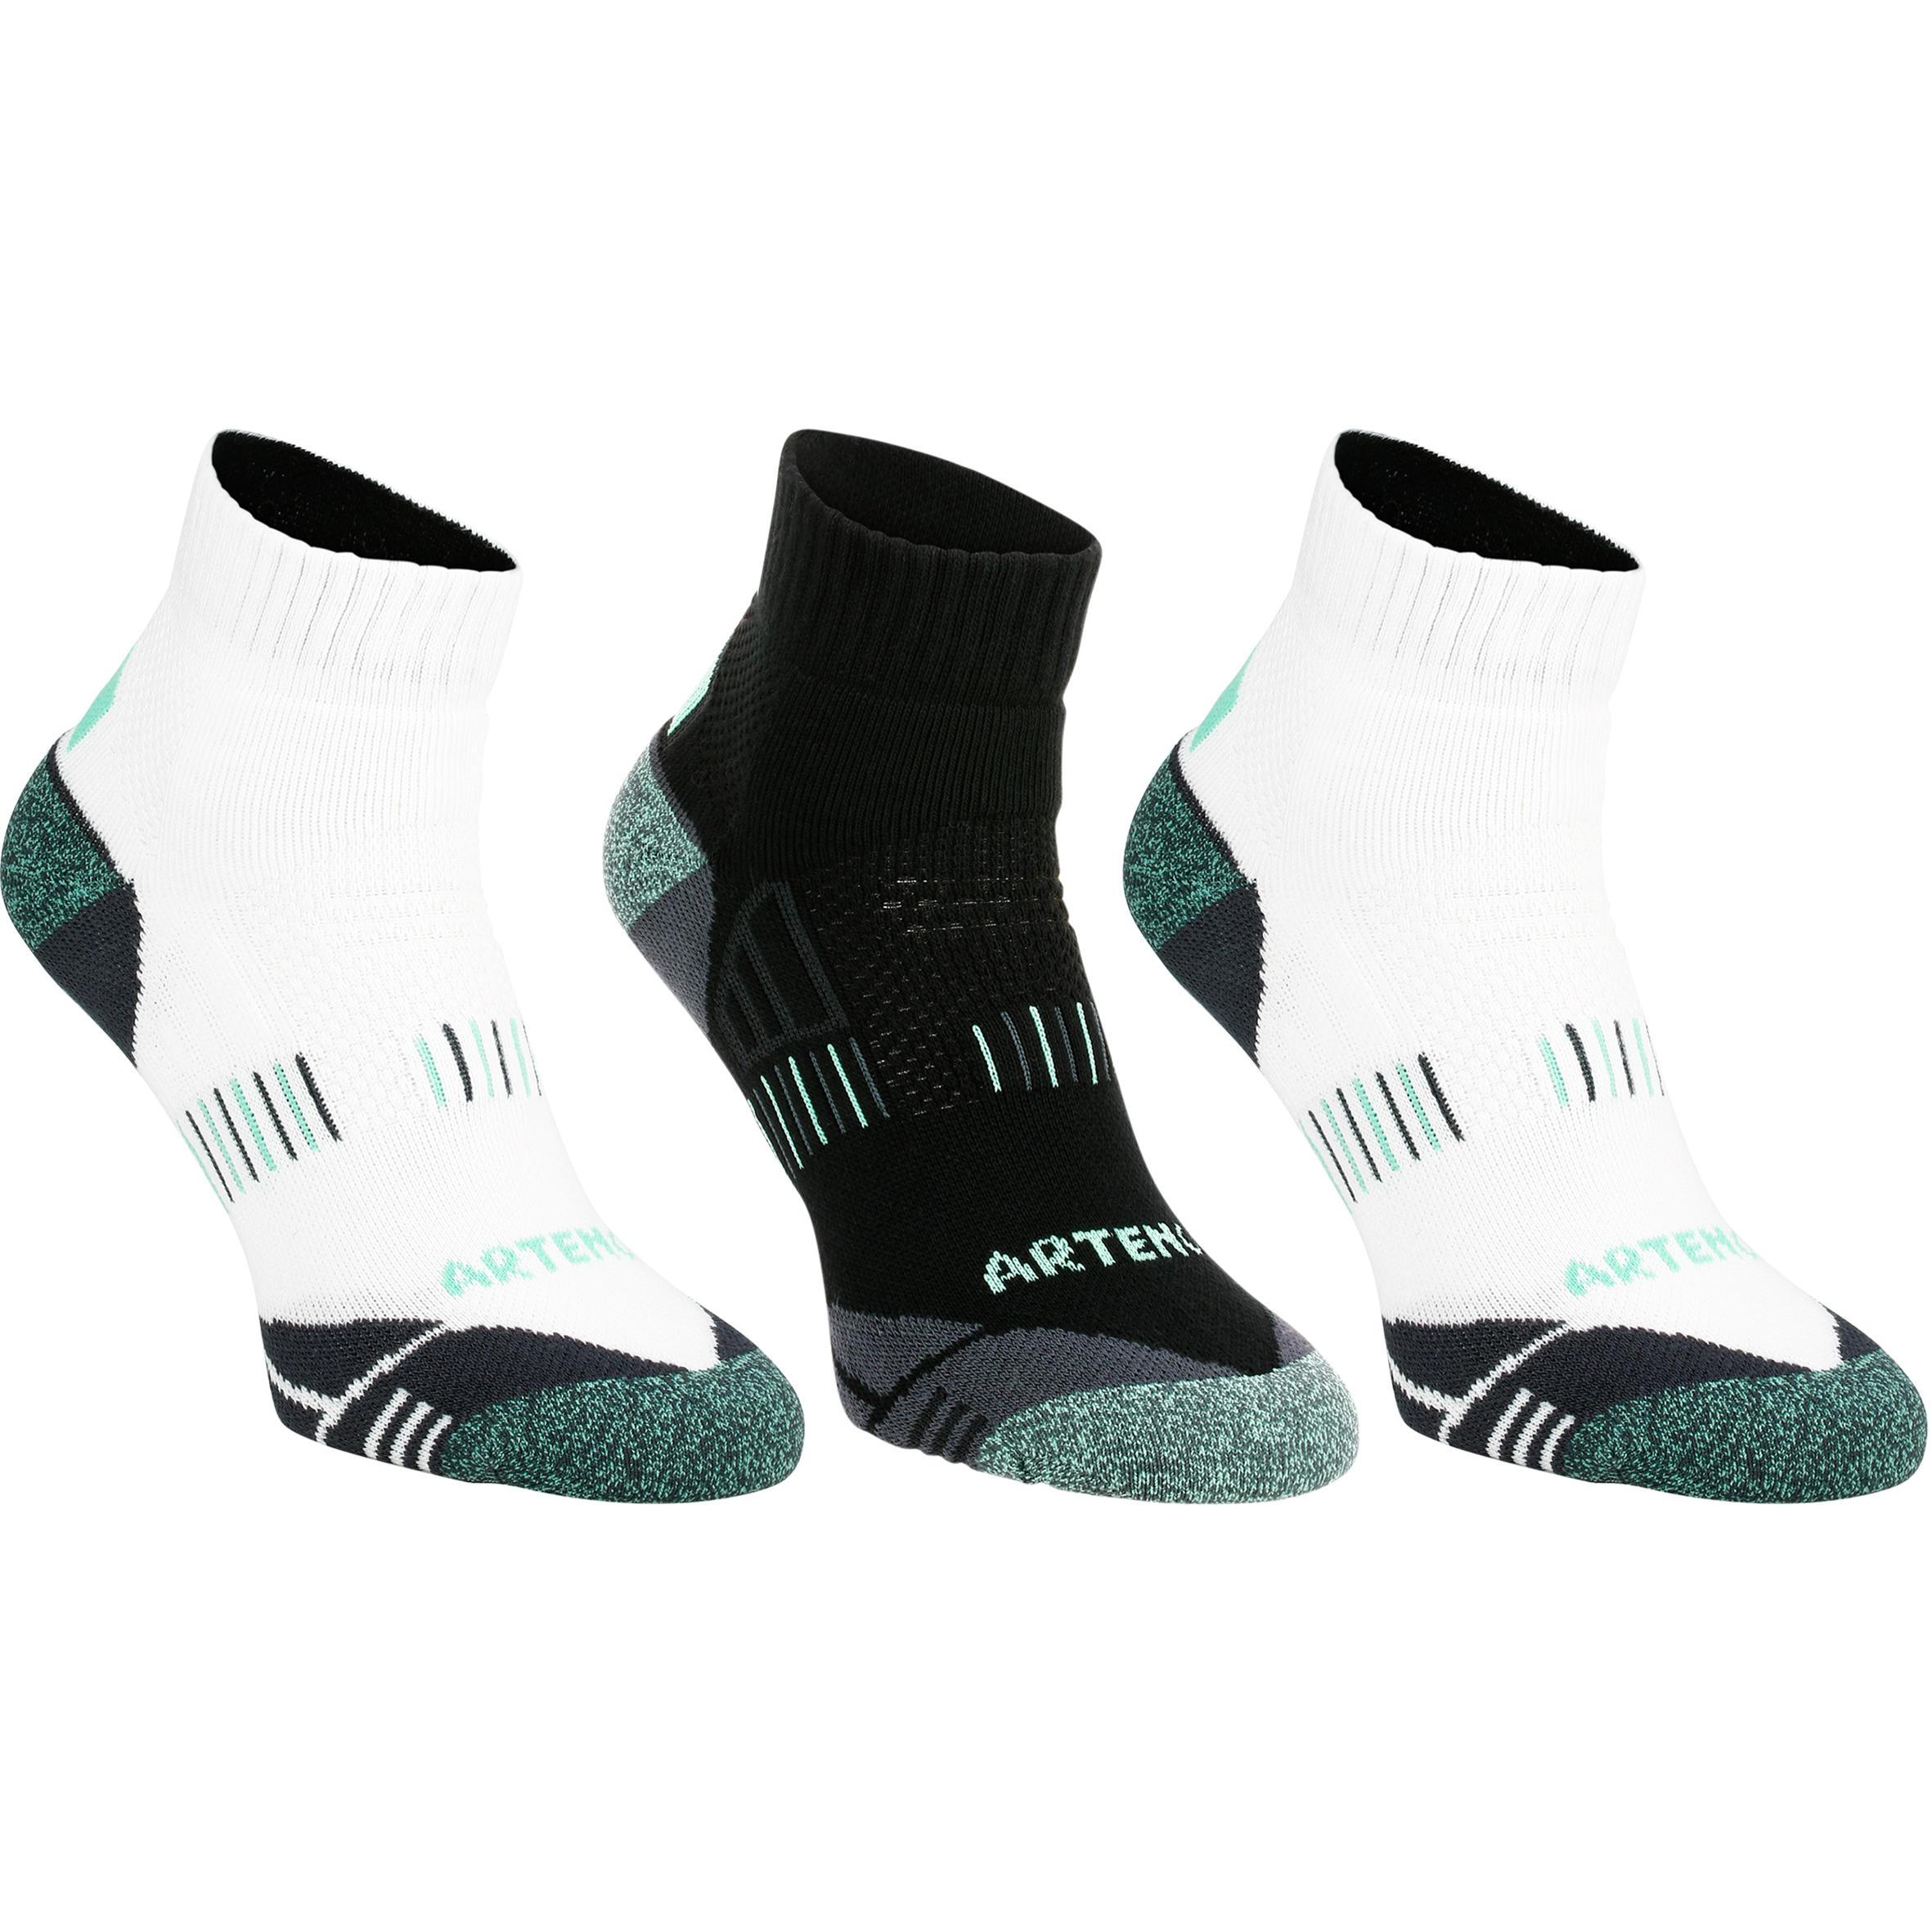 RS 900 Adult Mid Sport Socks 3-Pack - White/Green